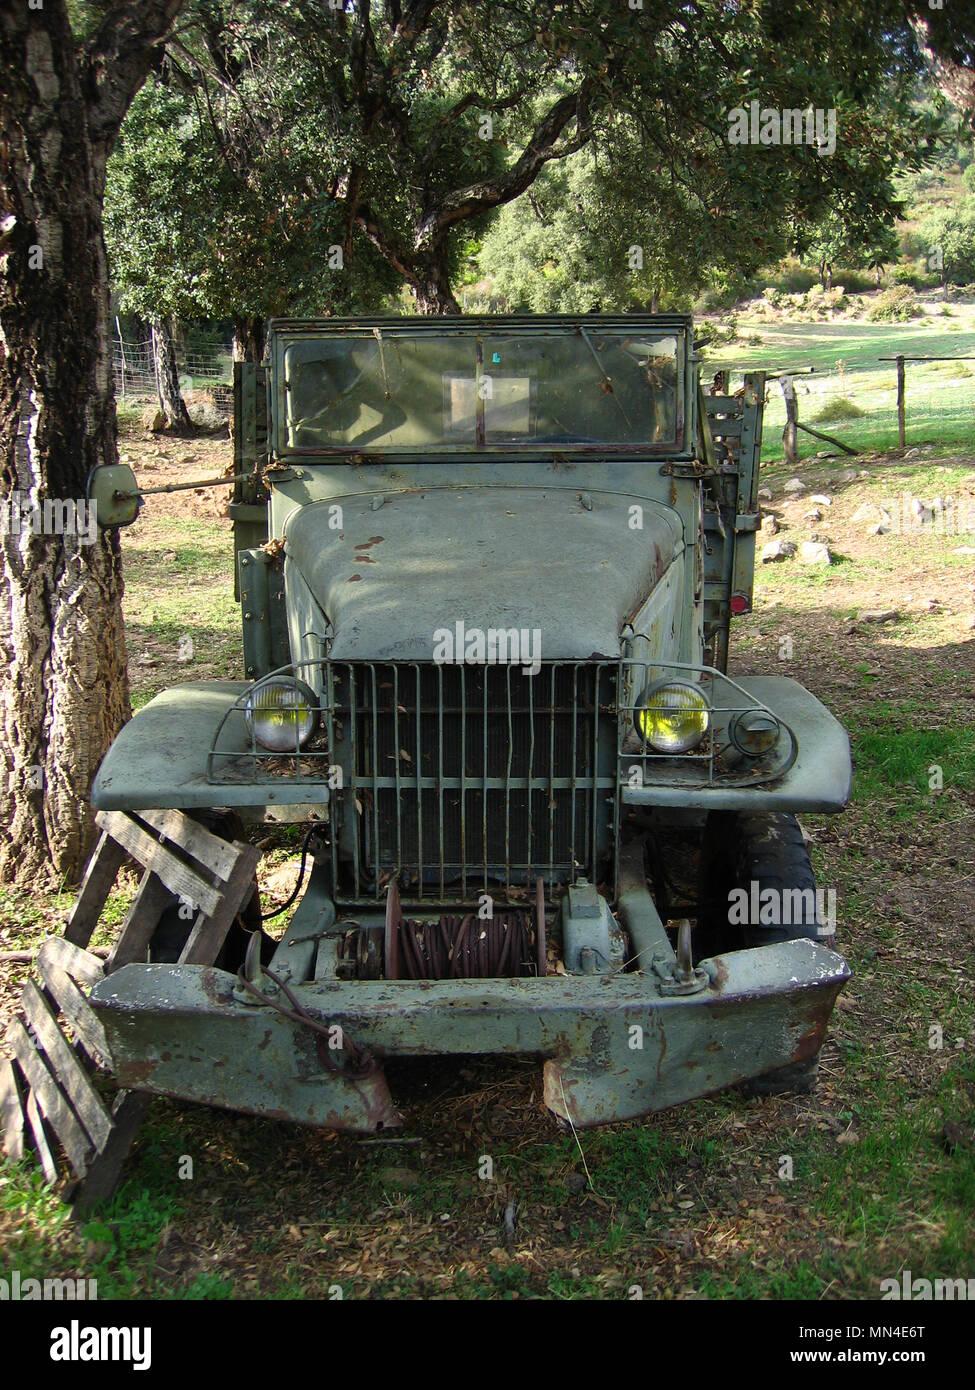 Italian Army World War Ii Stock Photos & Italian Army World